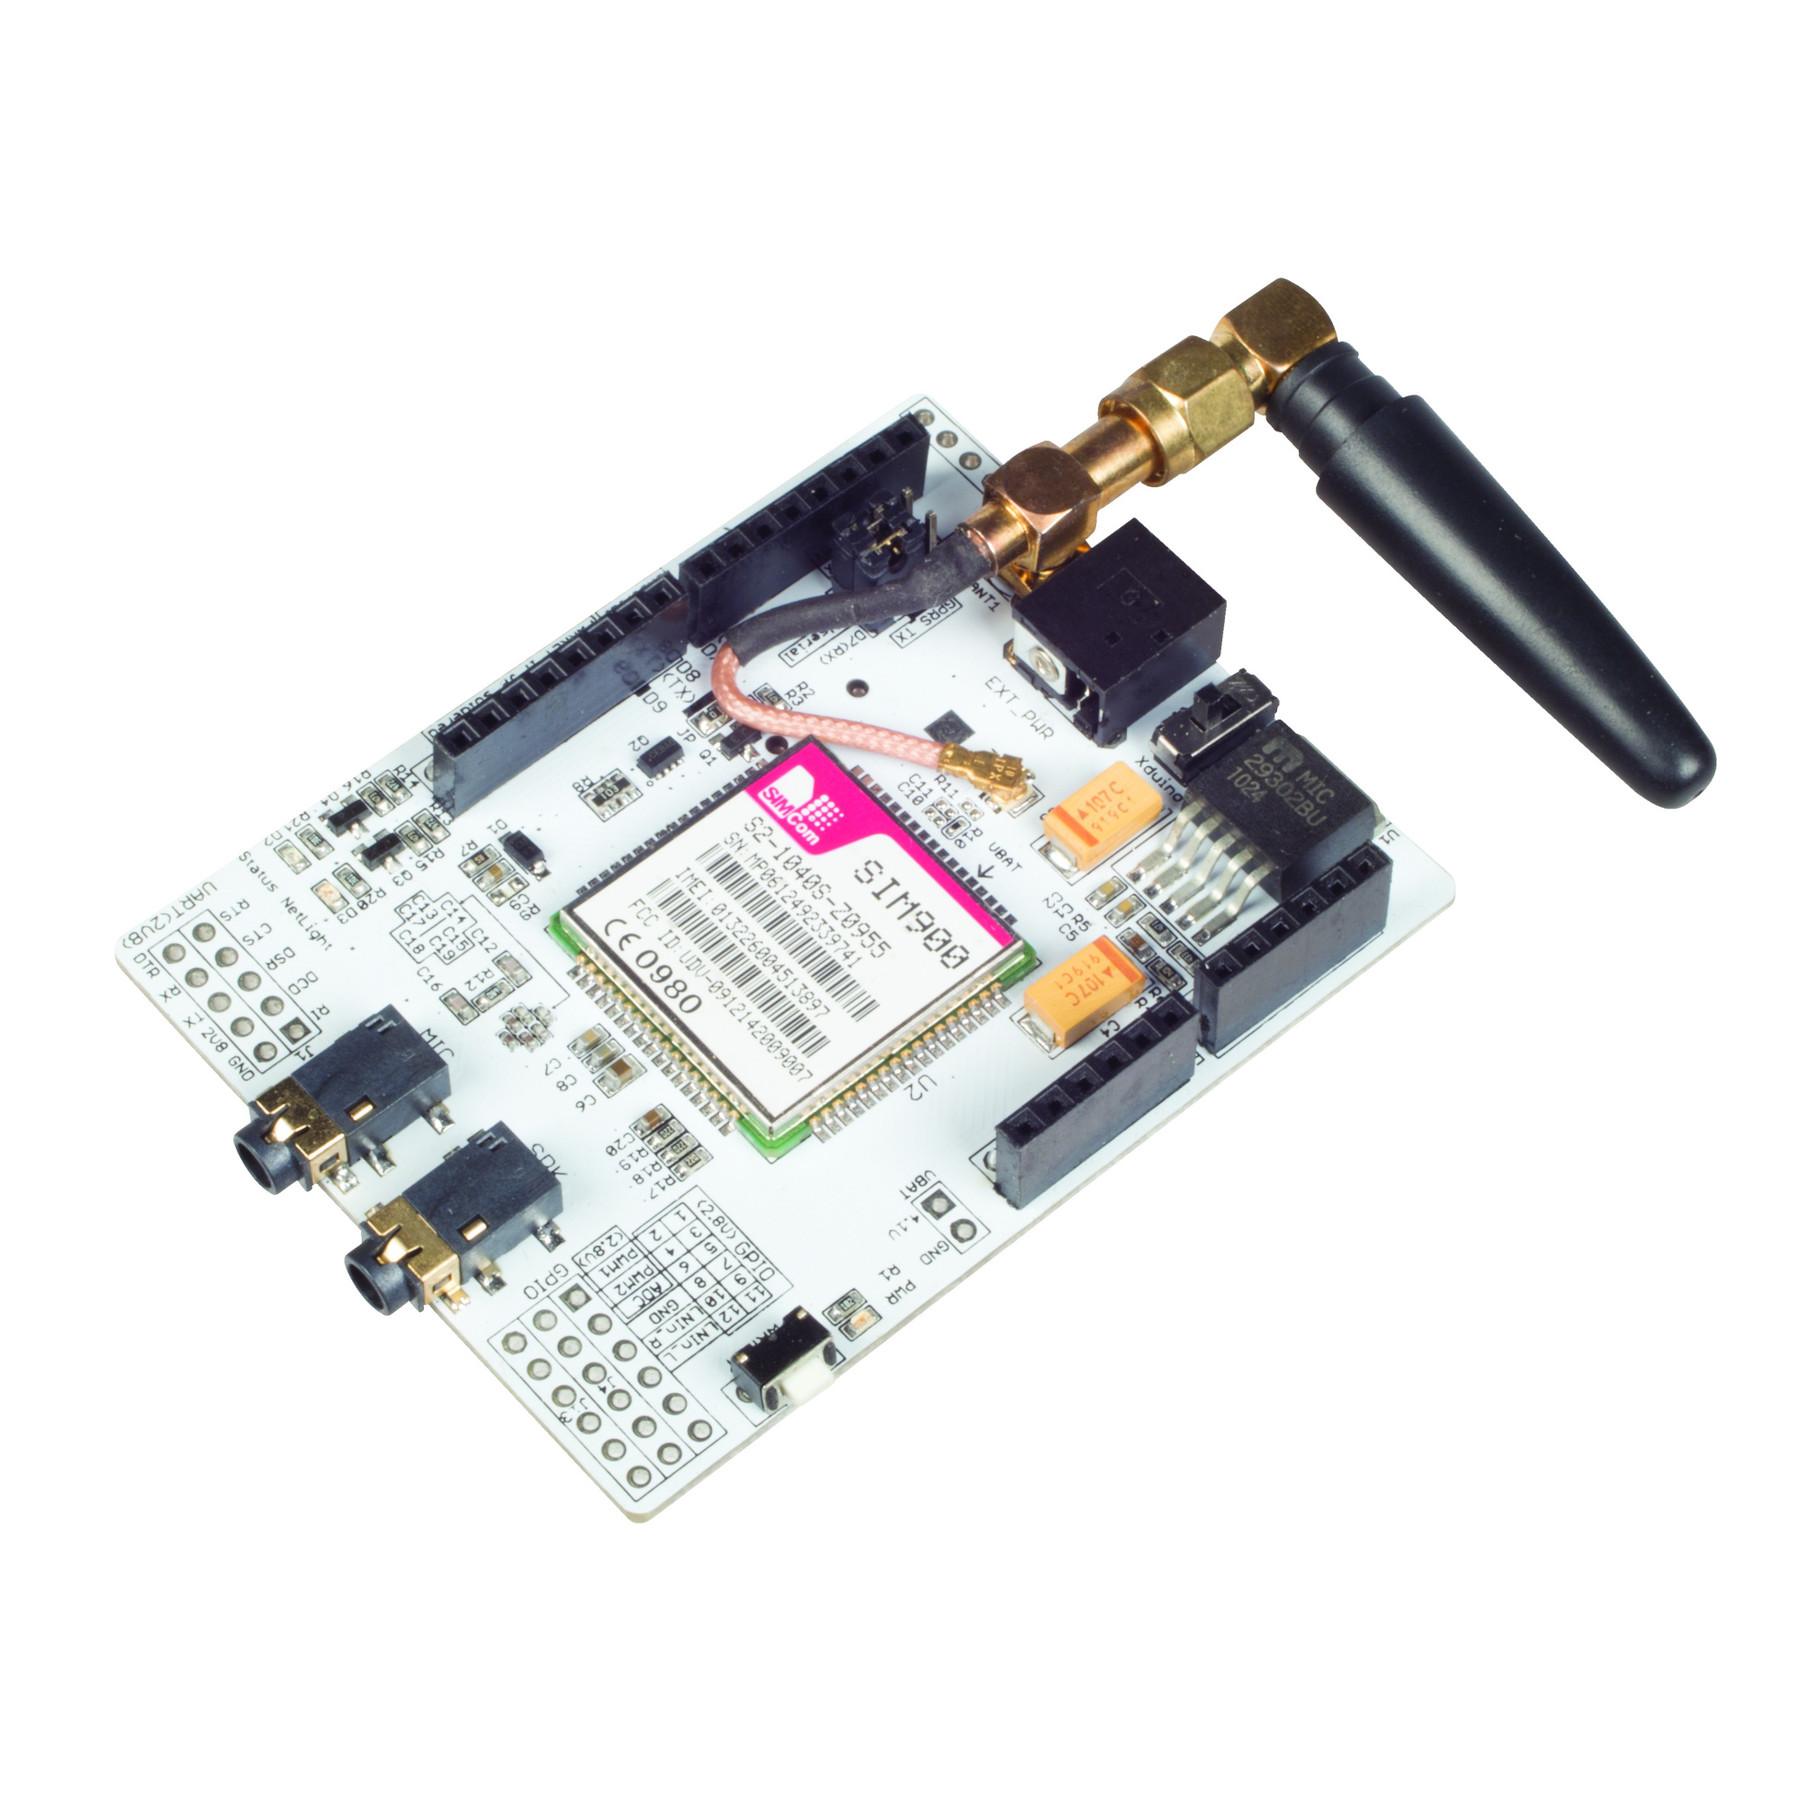 Quad band sim gprs gsm shield board for arduino new